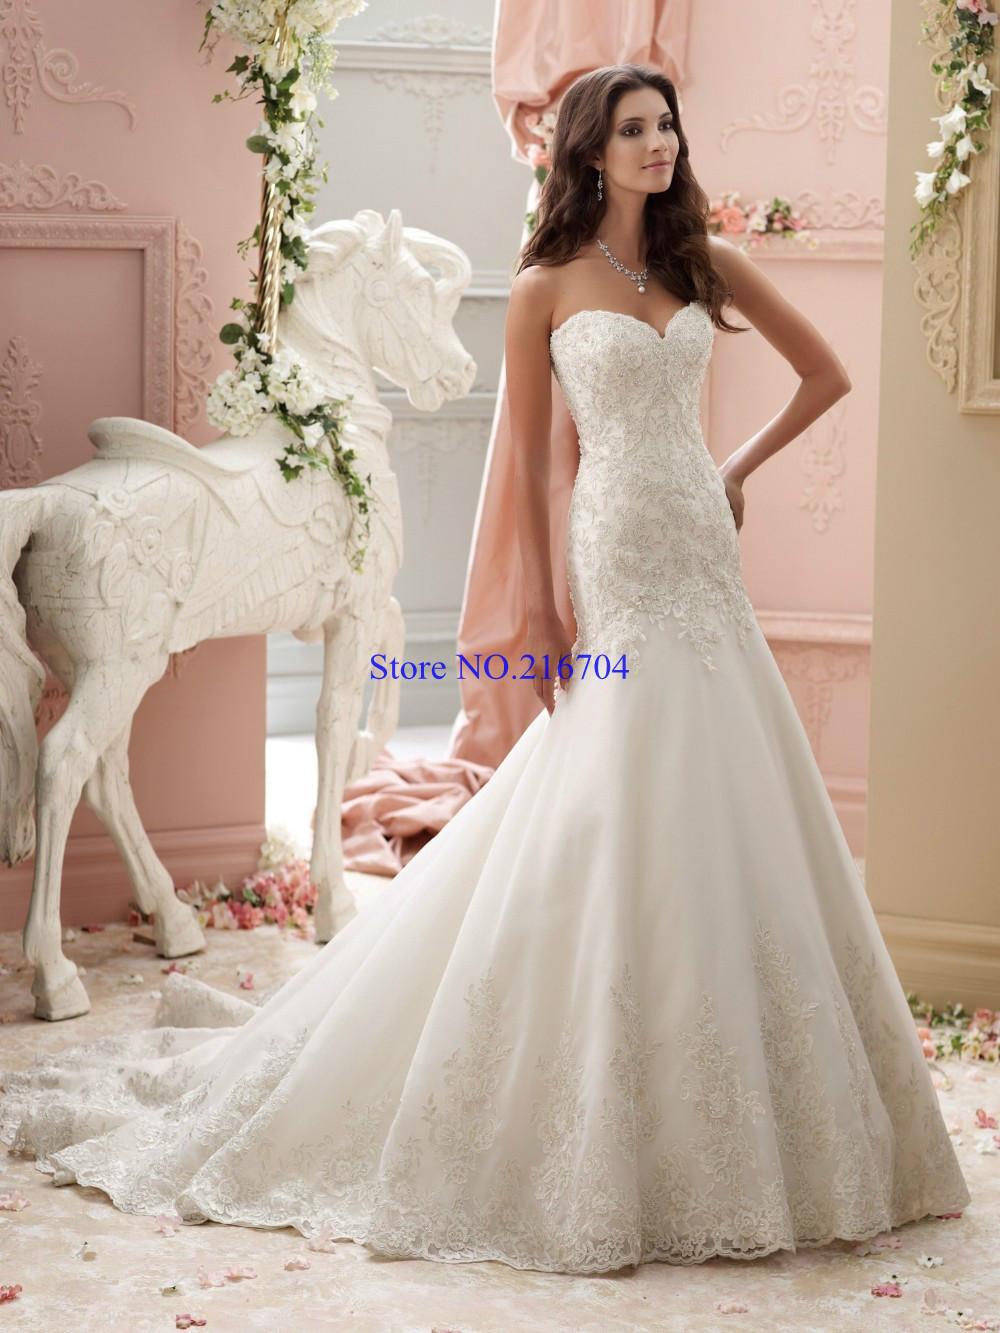 buy wholesale wedding dresses